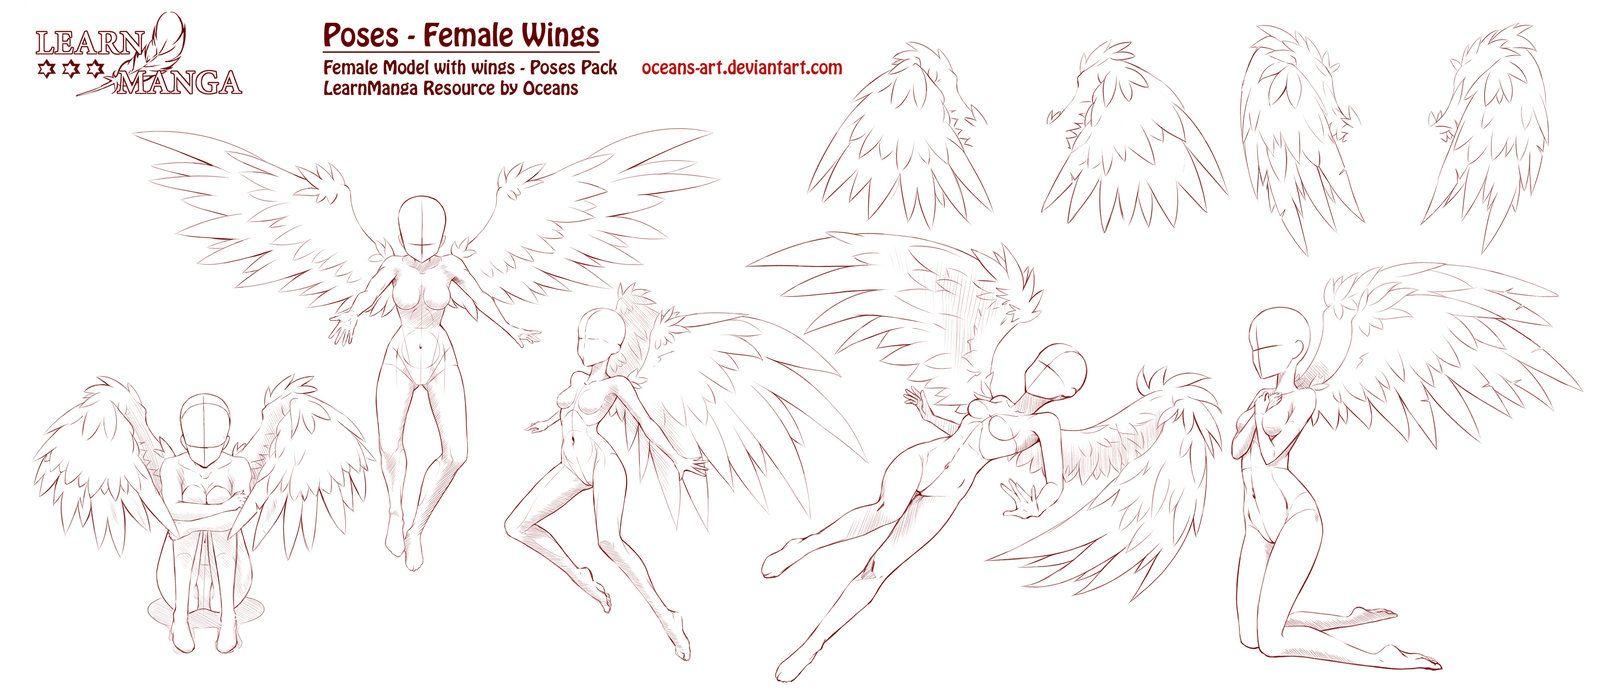 Ejwvymenwyamambdgacmiwbnmqorrfilbyhzqrp728897q3ucapv7sj9rszsx8xtbhpkg6kwxvurz0n9mdq3yysrlpervgqatiqxlp4dbhiabp8iy Qyfc Anime Poses Reference Wings Drawing Art